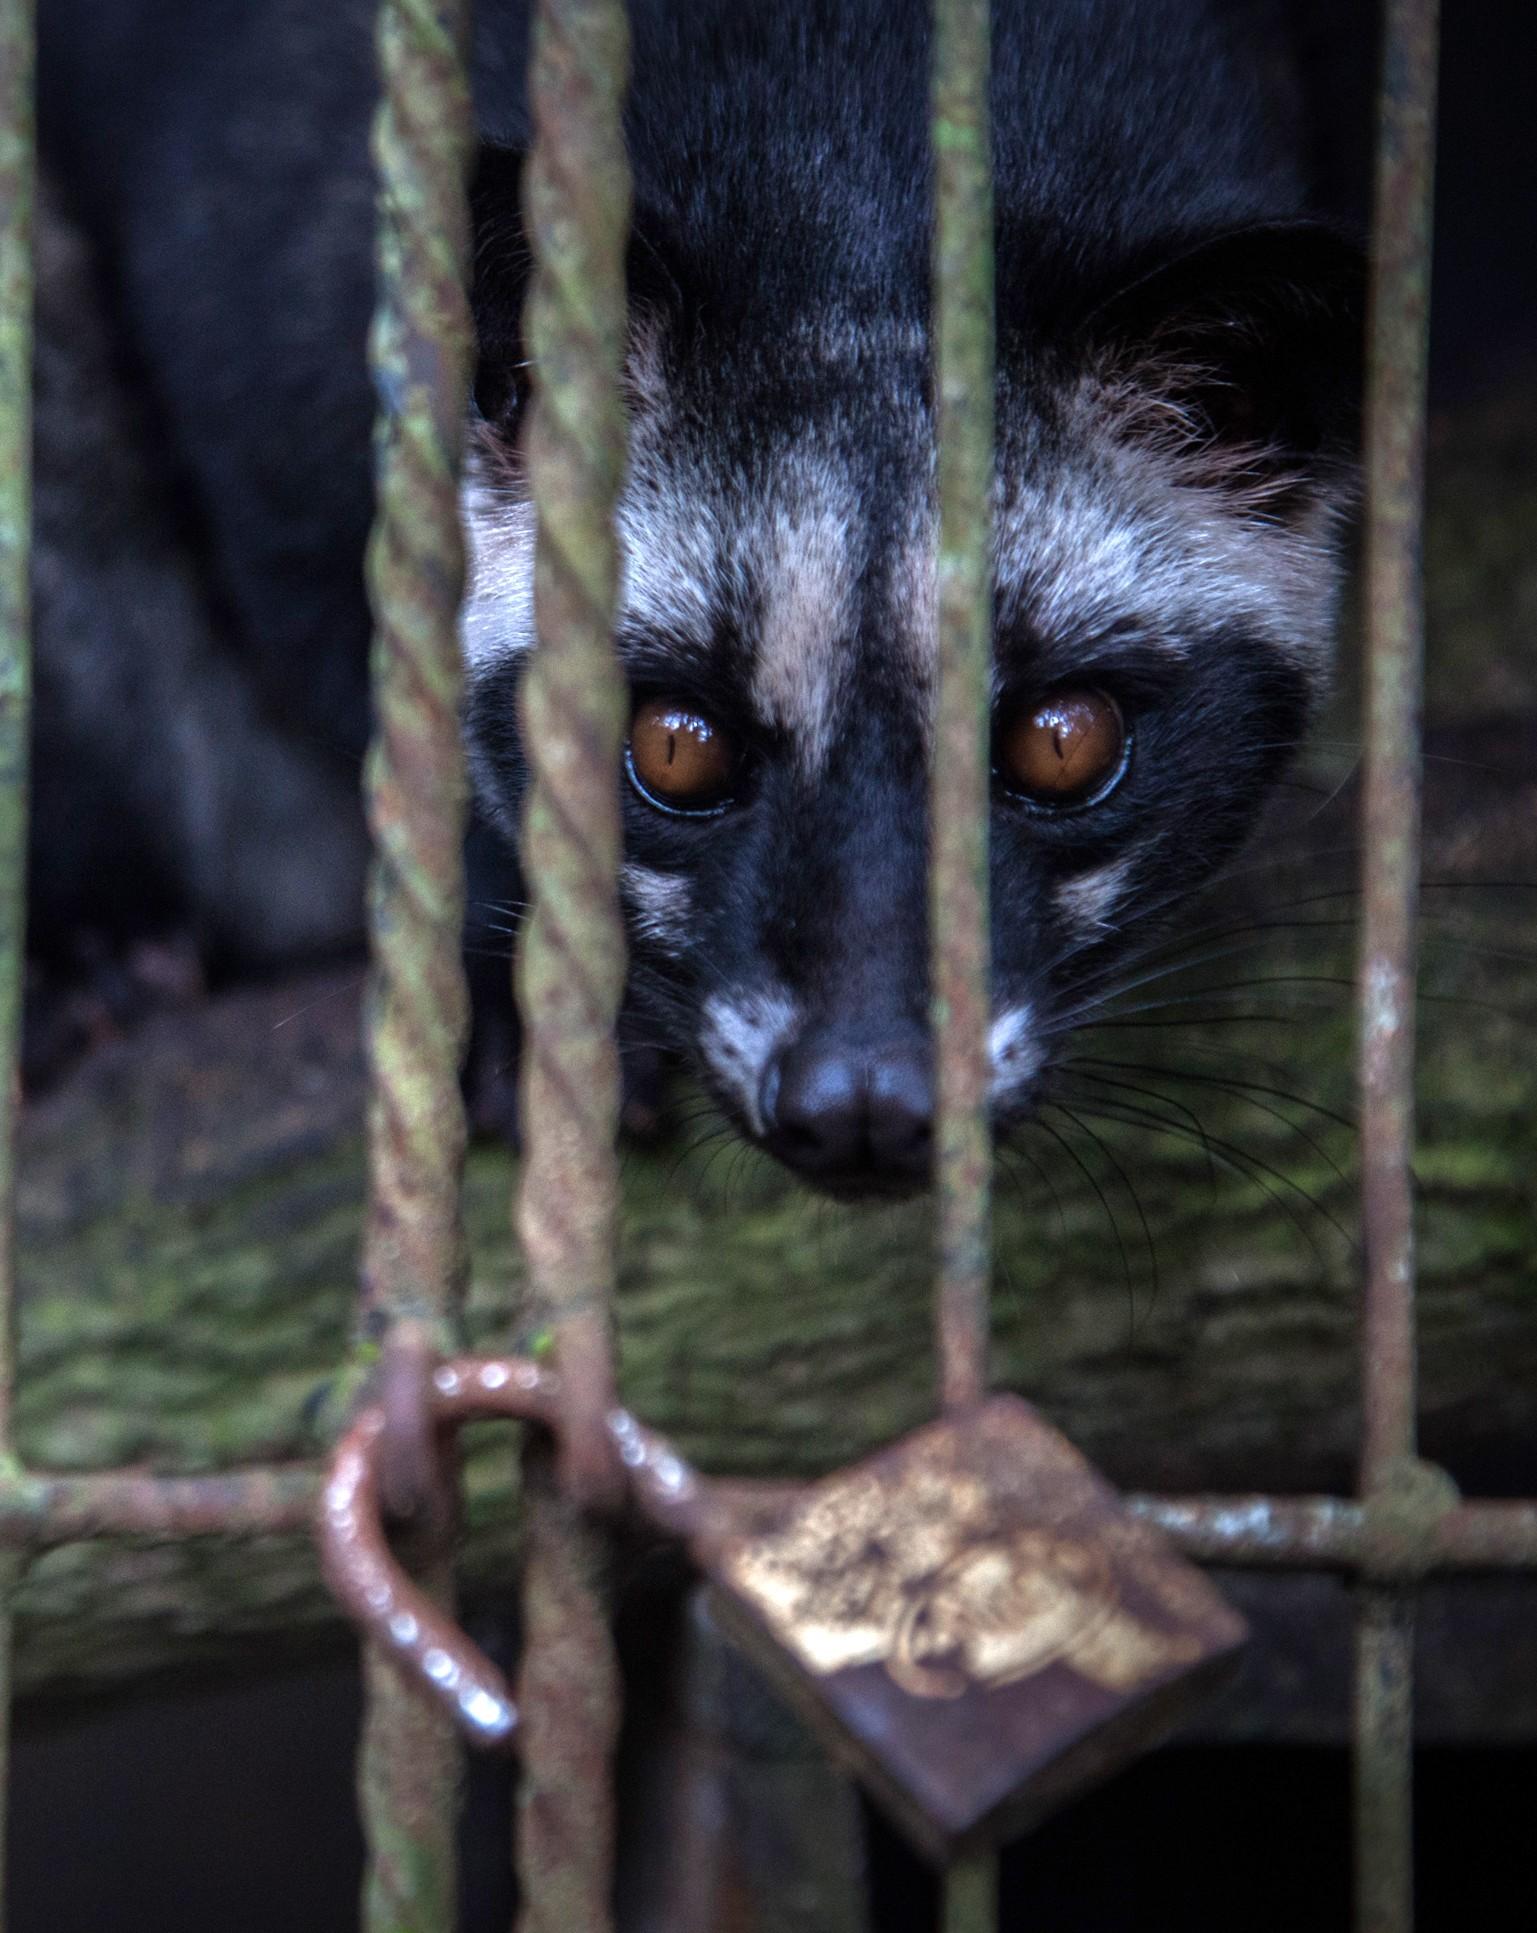 A caged civet cat at a Luwak coffee farm in Tampaksiring, Bali, Indonesia